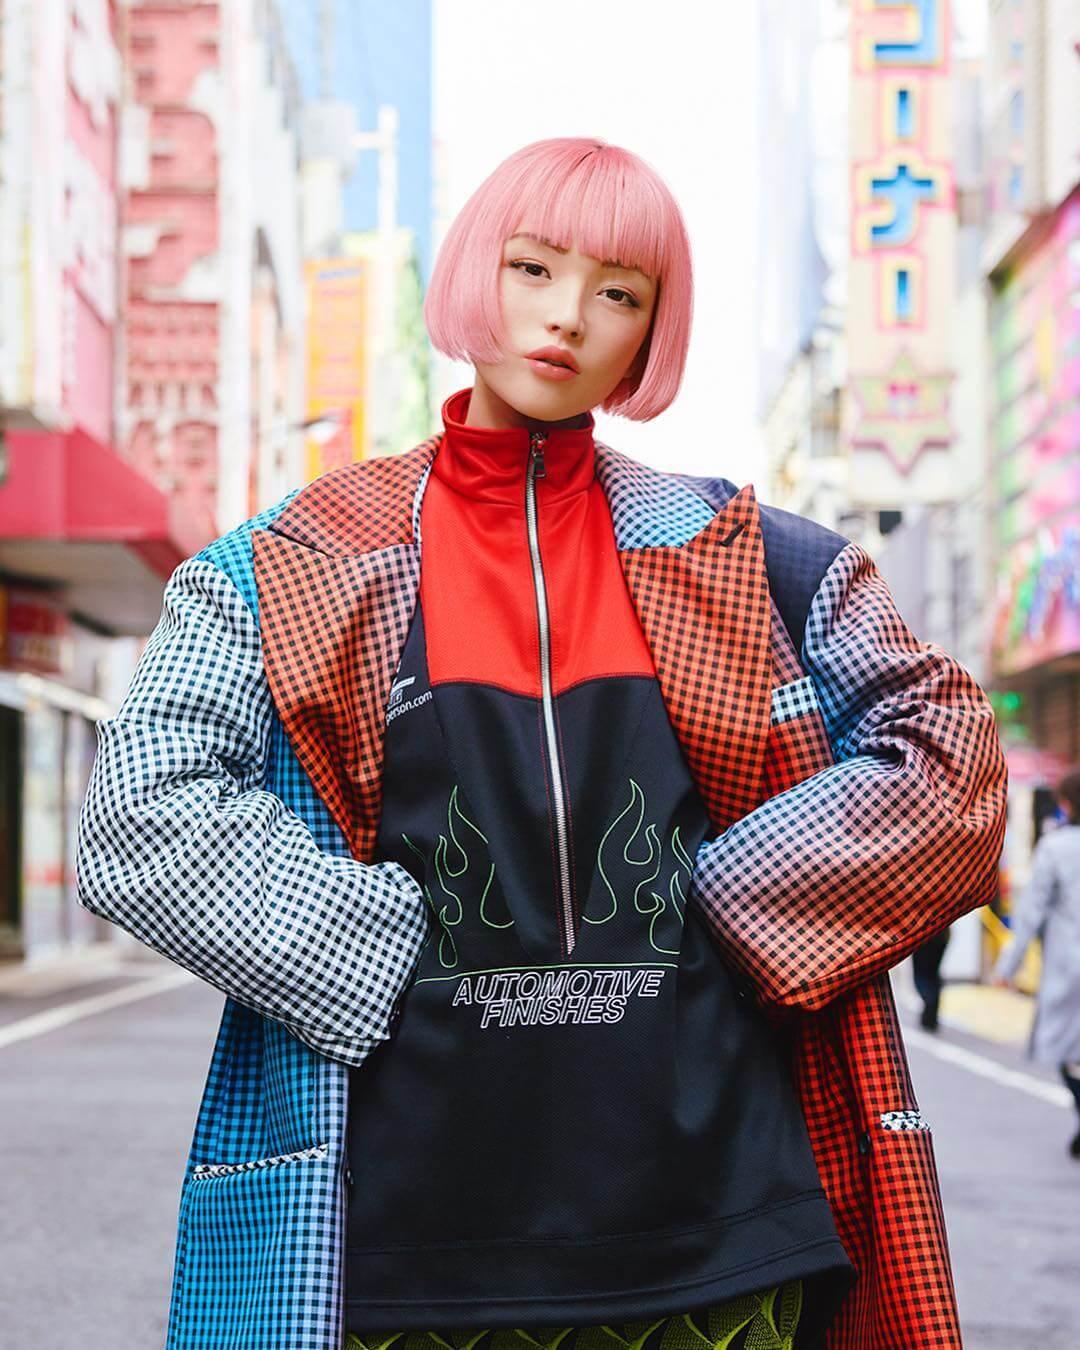 Así se creó Imma, la modelo virtual japonesa que podría pasar por humana